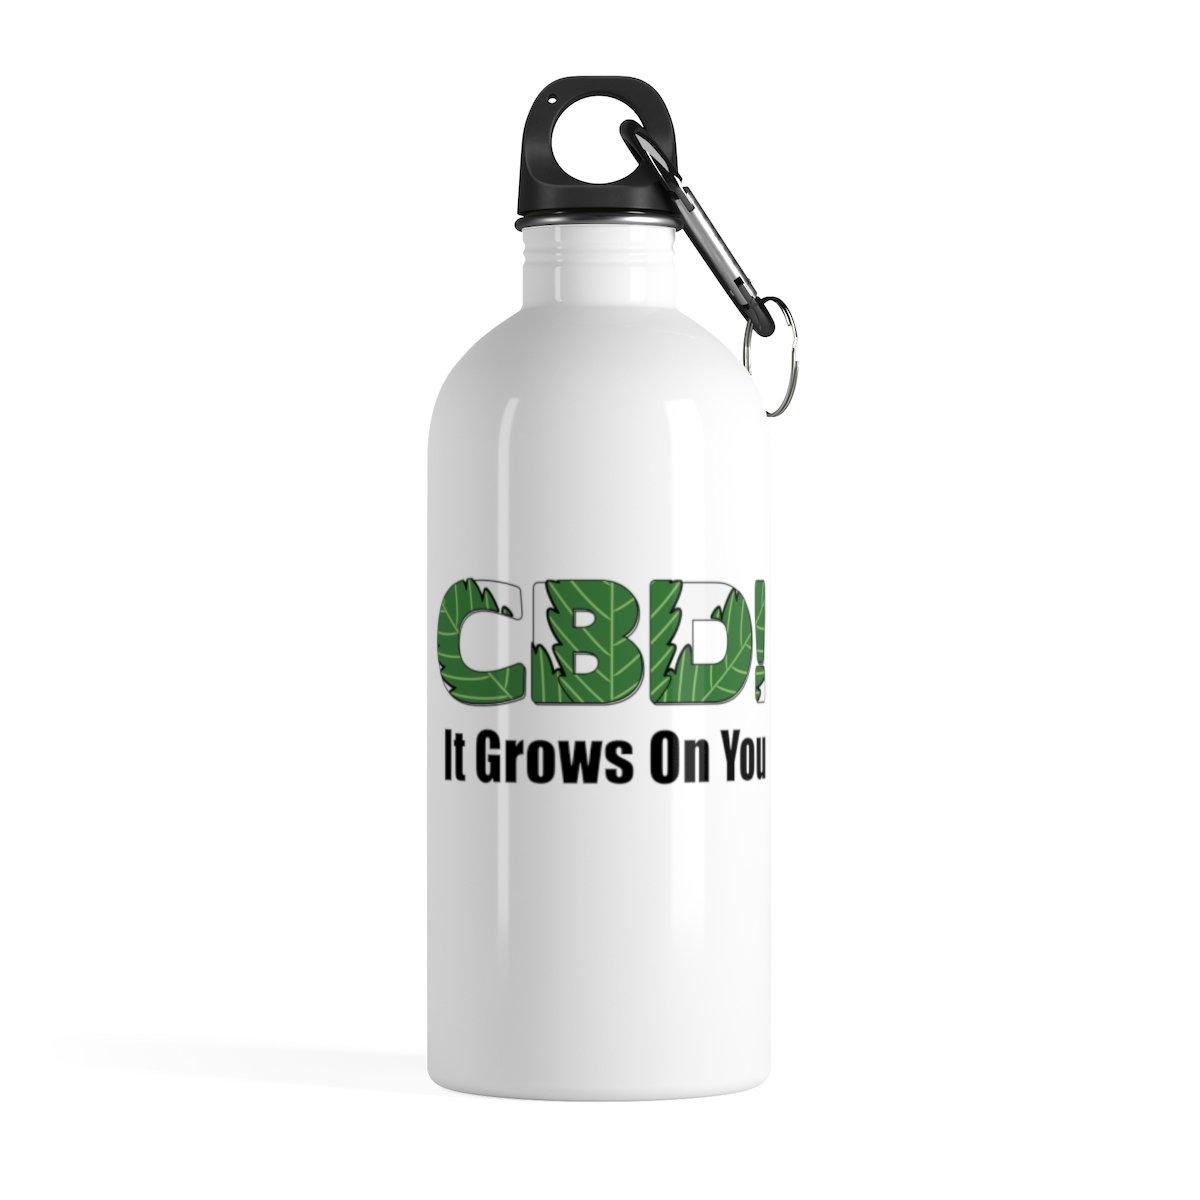 CBD It Grows On You Water Bottle - Promote your CBD Business with Marketing Merchandise - Because no one knows what you do until you tell them  #CBD #Hempdistributor #CBDdistributor #ctfo #hempworx #CBDMD #hempwHerbals #auroracannabis #swagforcbd